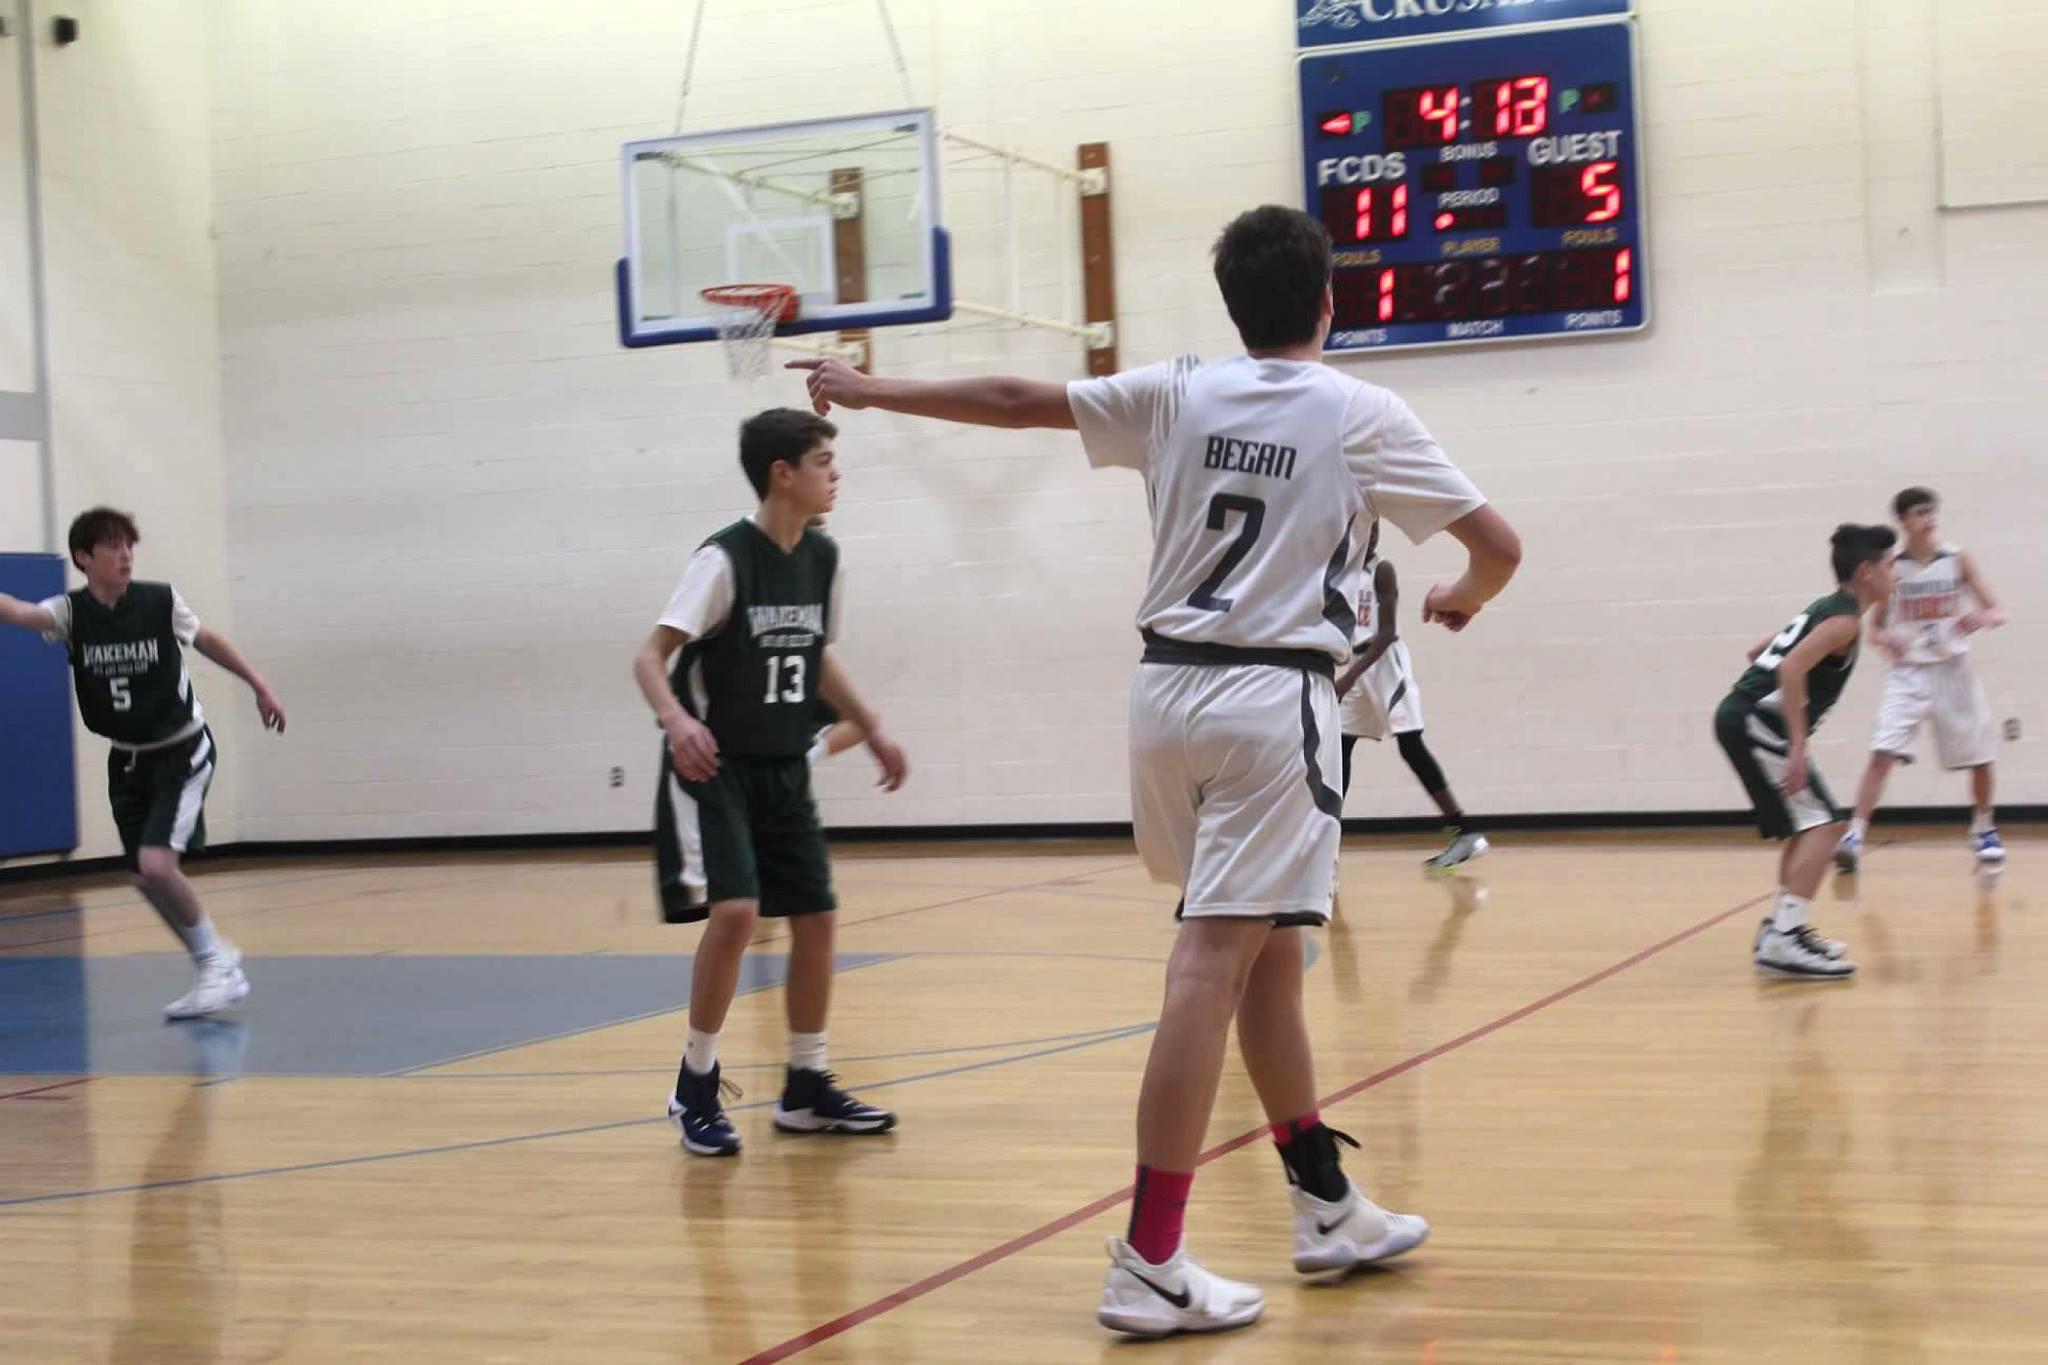 Fierce Top Wakeman Basketball